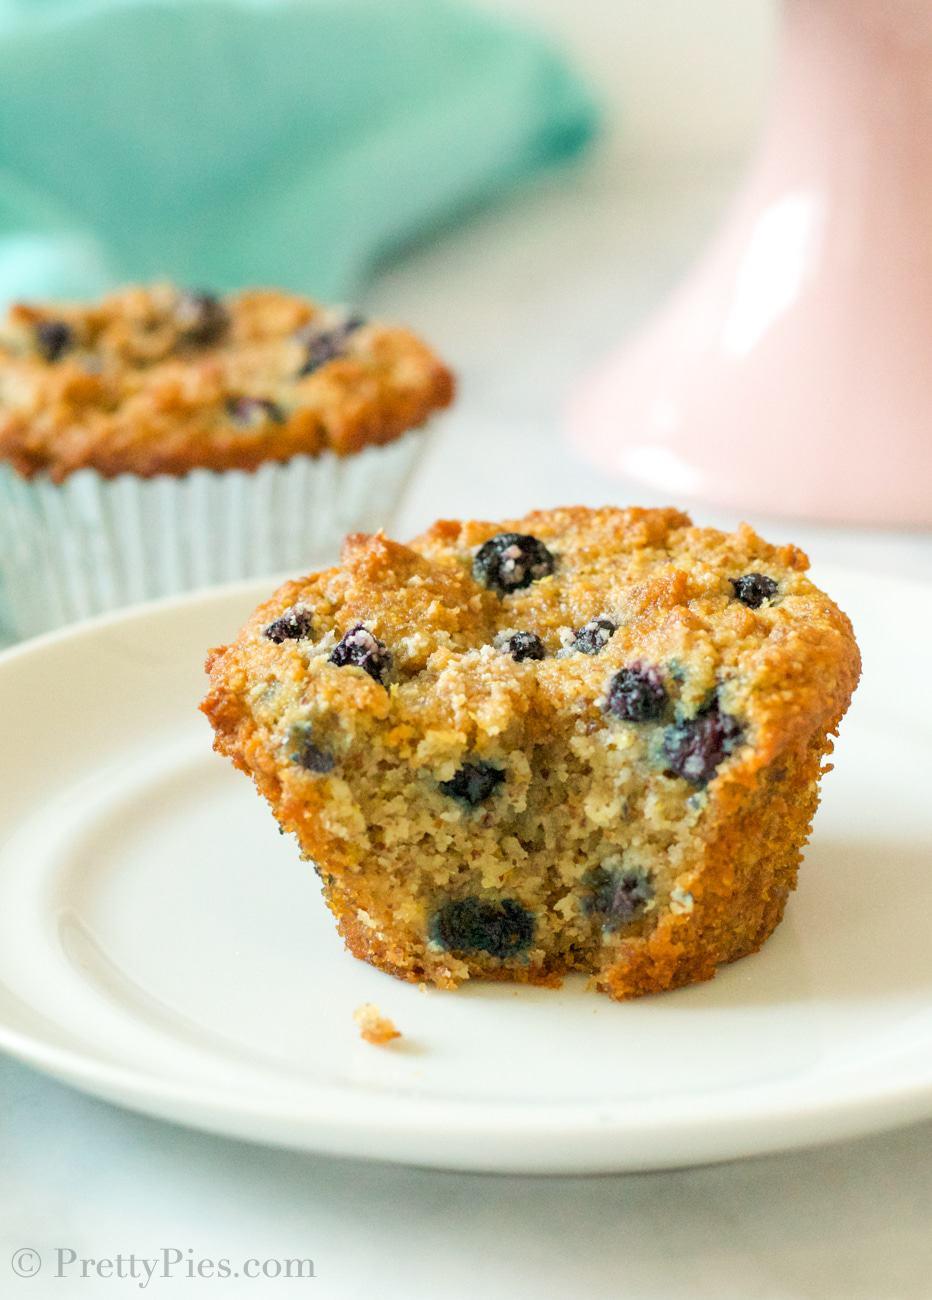 Low-Carb Blueberry Muffins (Paleo, Vegan)